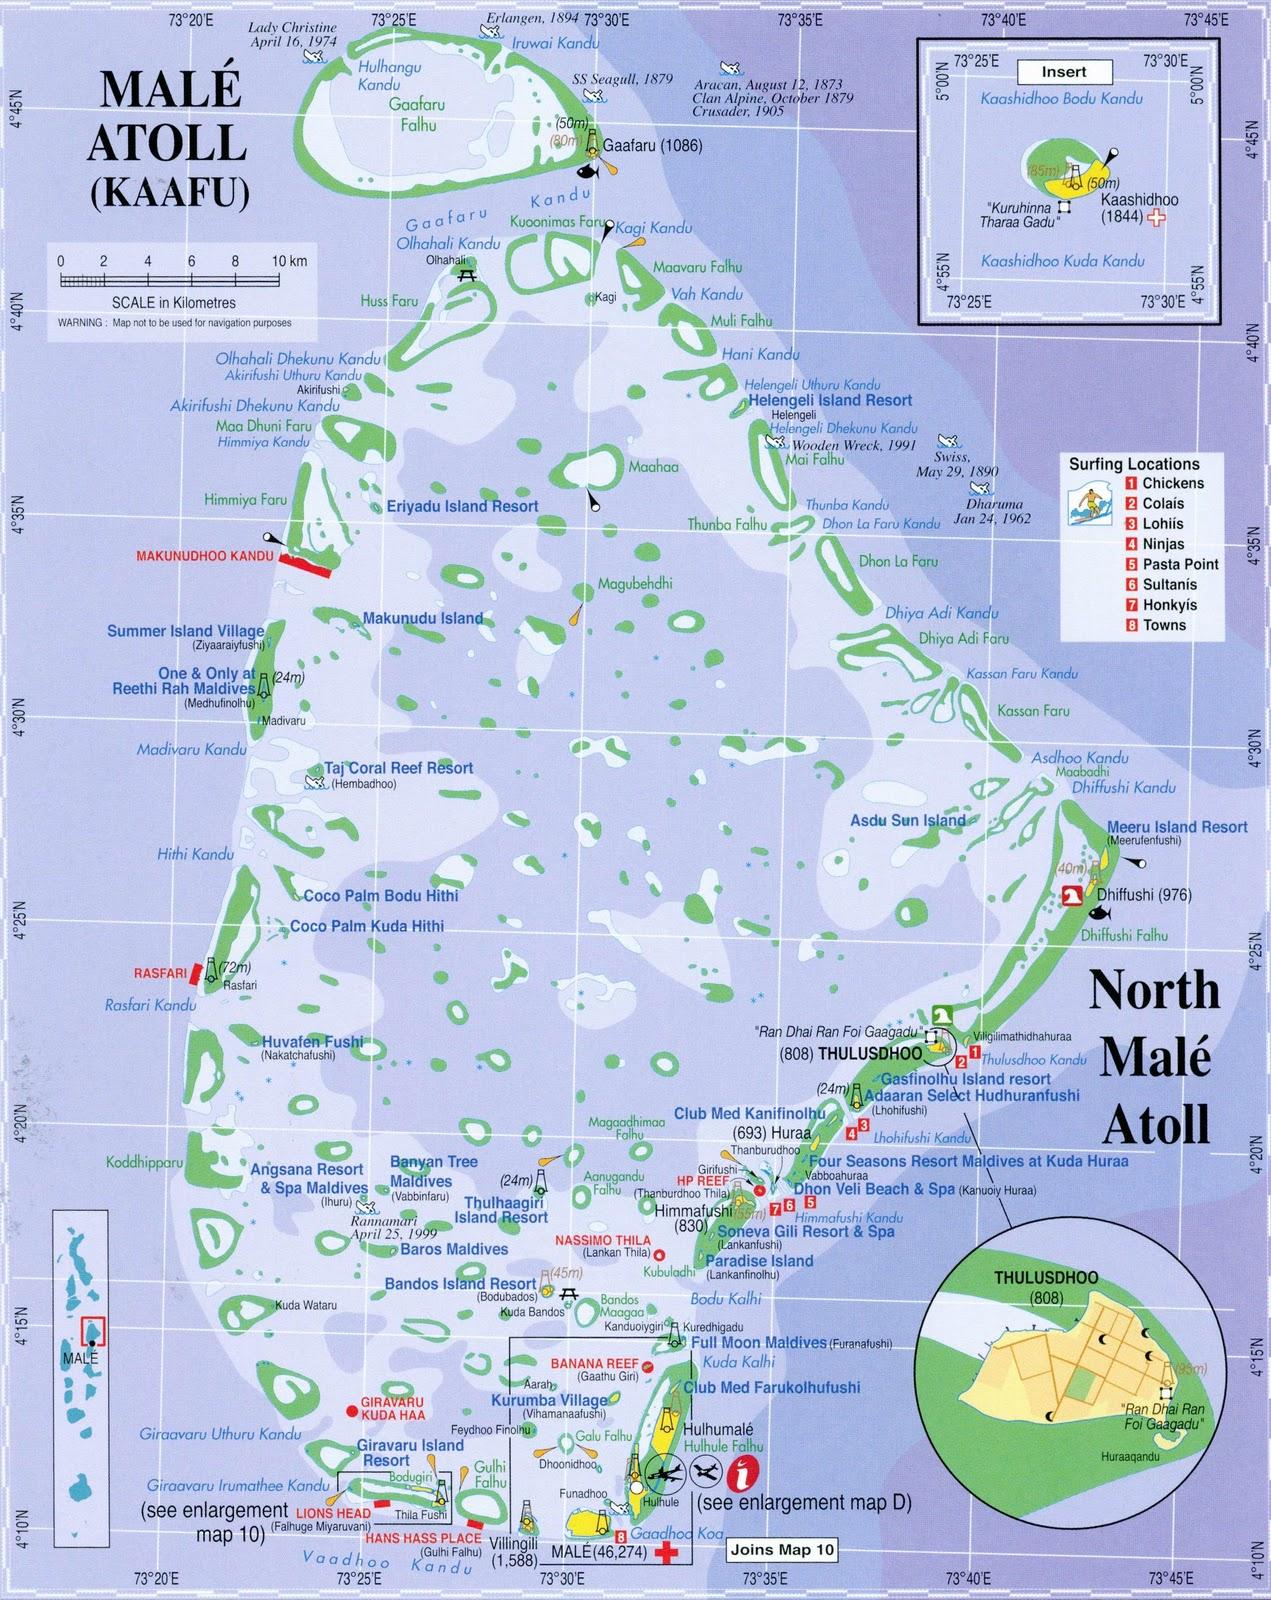 North Male Atoll (Kaafu) Map